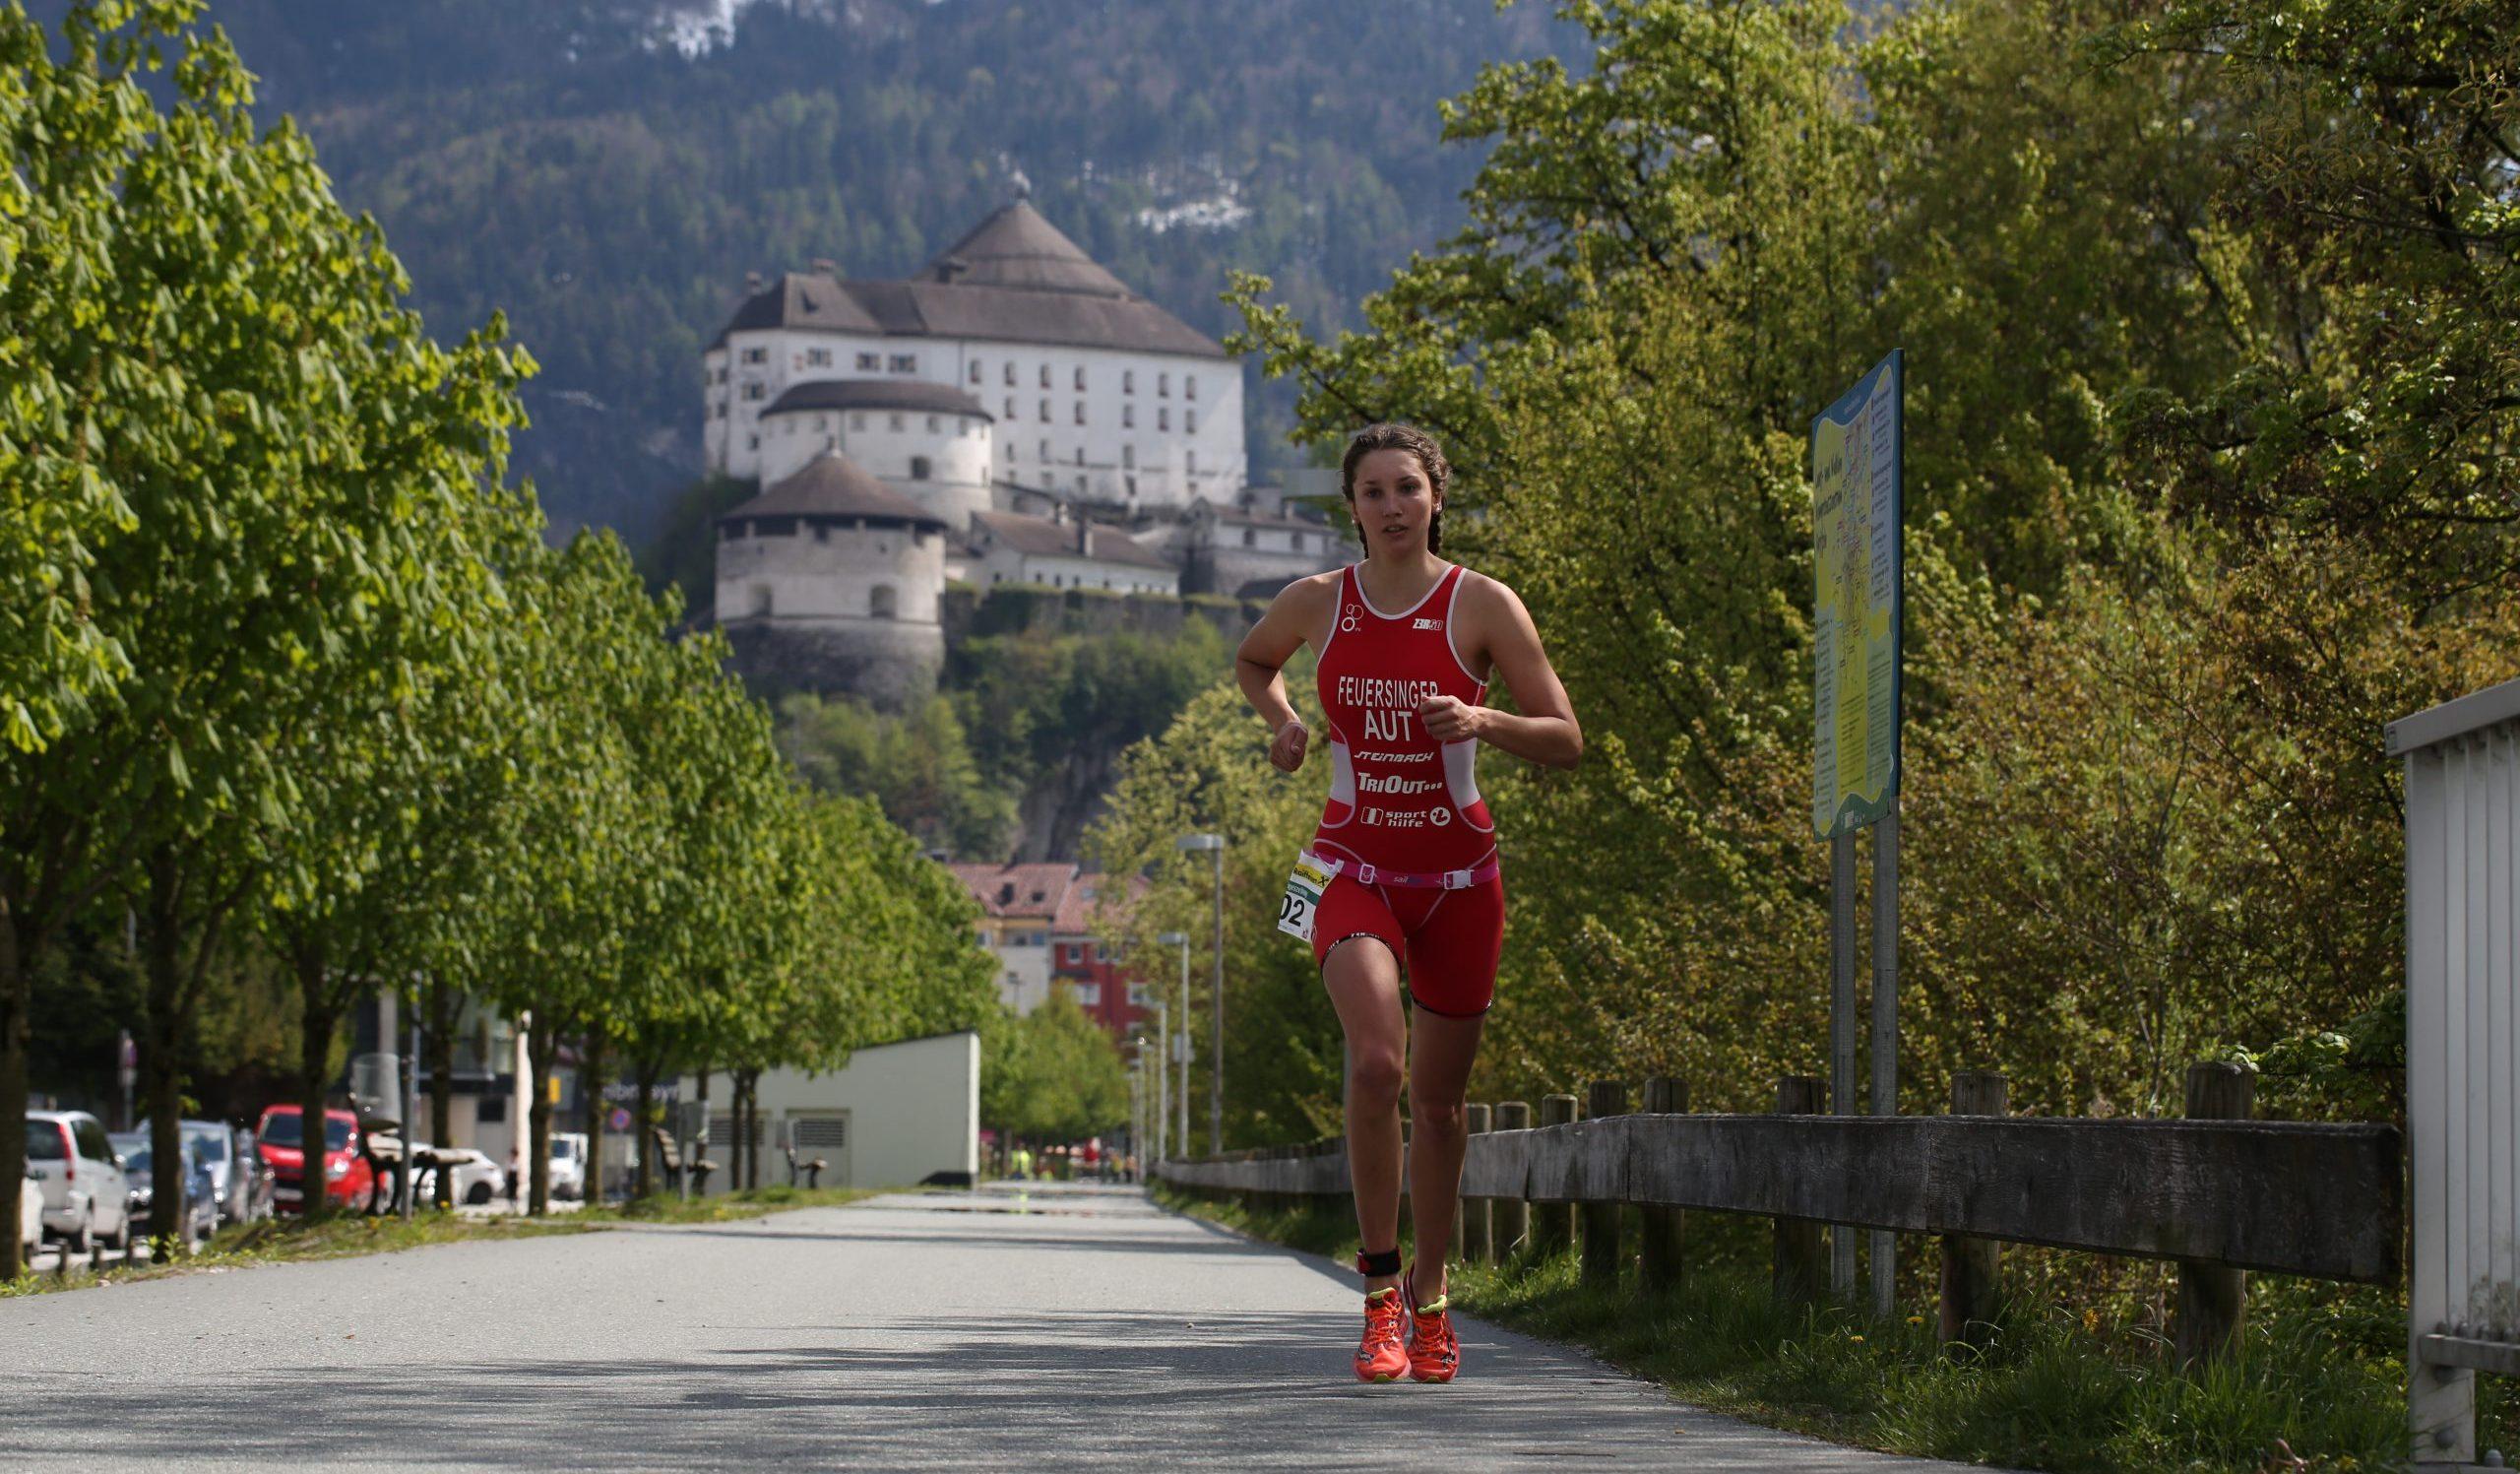 https://tri-x-kufstein.at/wp-content/uploads/2020/02/TRI-X-Triathlon_2017_csportfotograf.com-9-scaled-e1581156192646.jpg